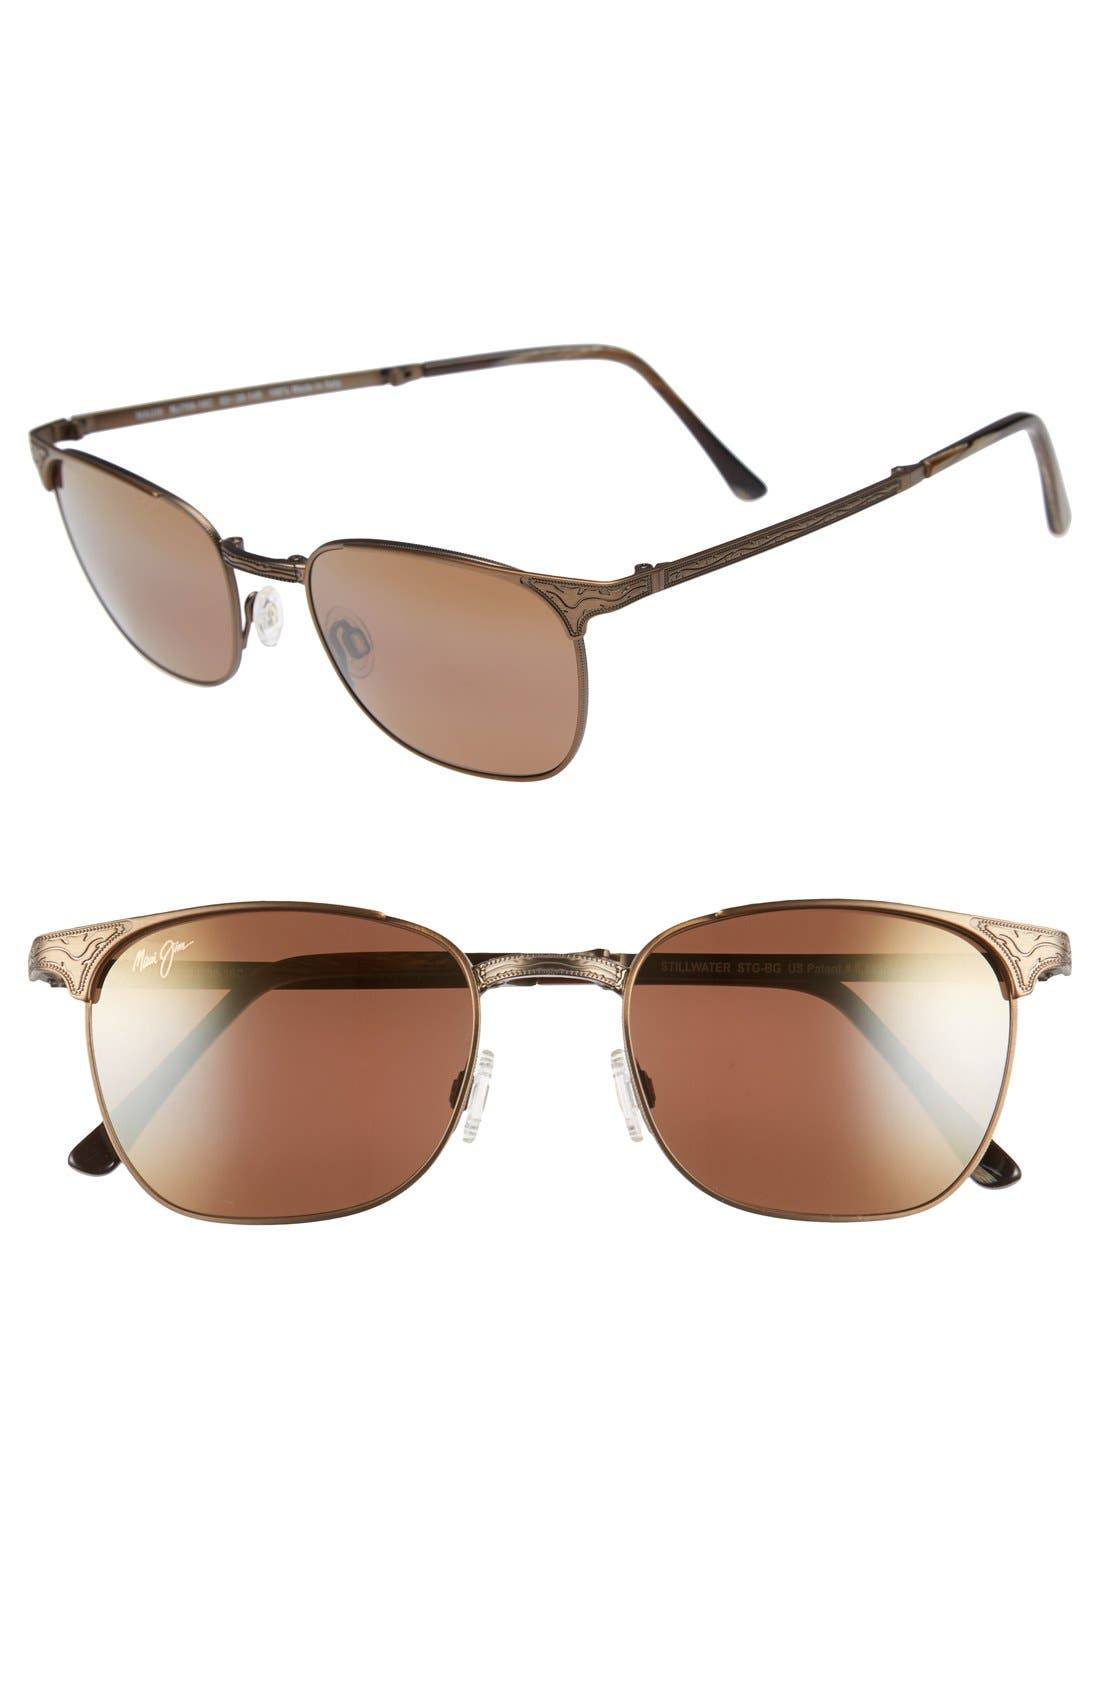 Maui Jim 'Stillwater' 52mm Polarized Sunglasses